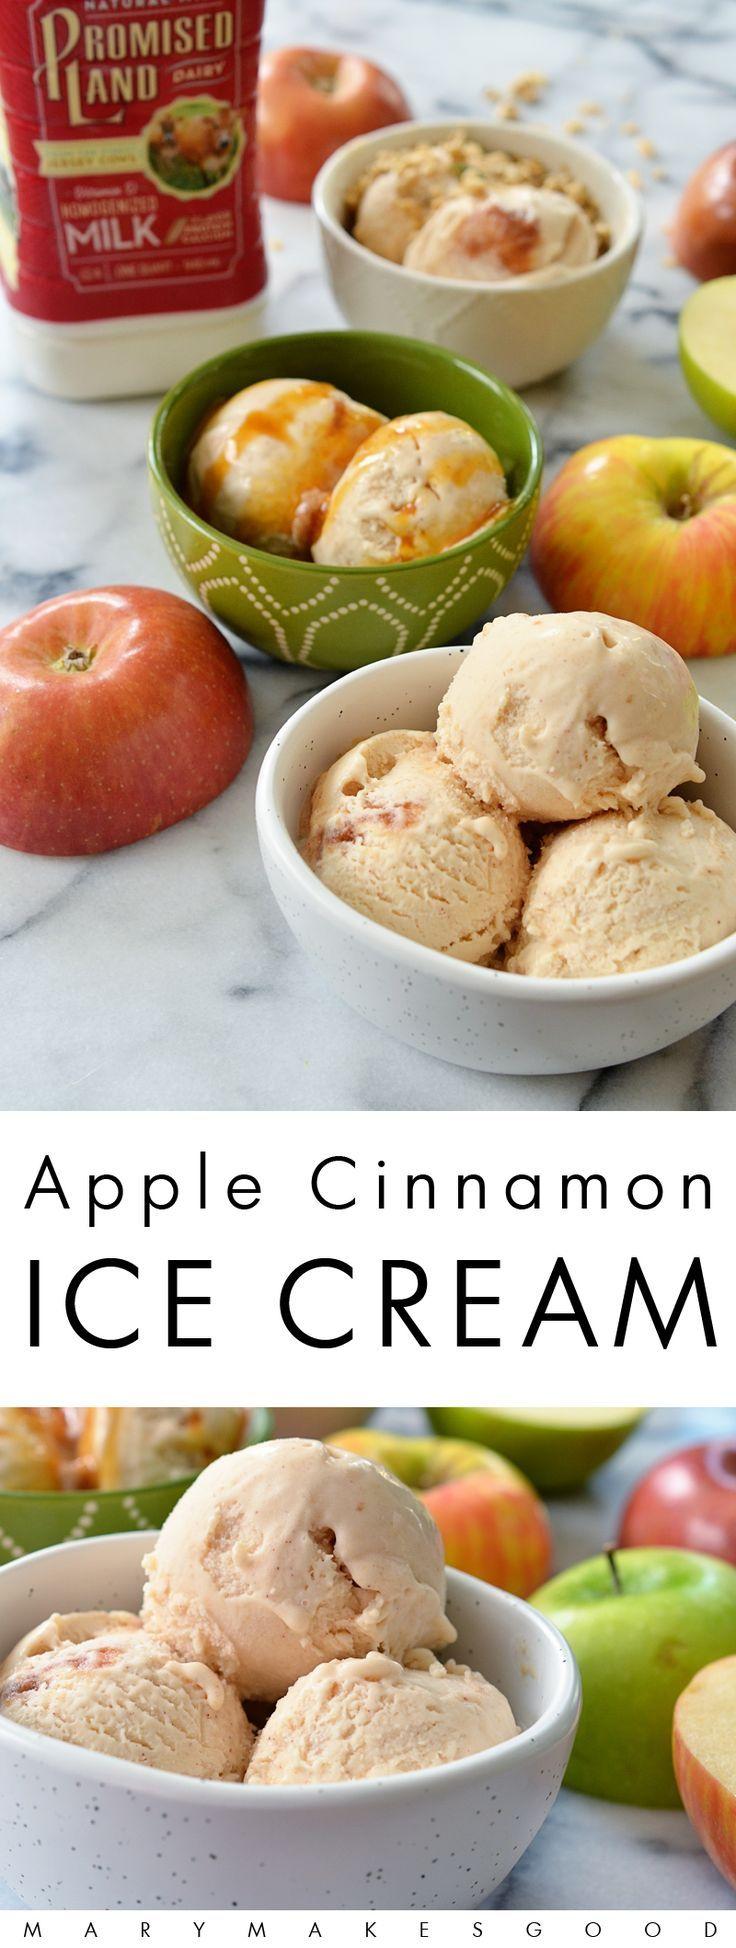 Apple Cinnamon Ice Cream Recipe   #sponsored by Promised Land Dairy #farfromordinarymilk